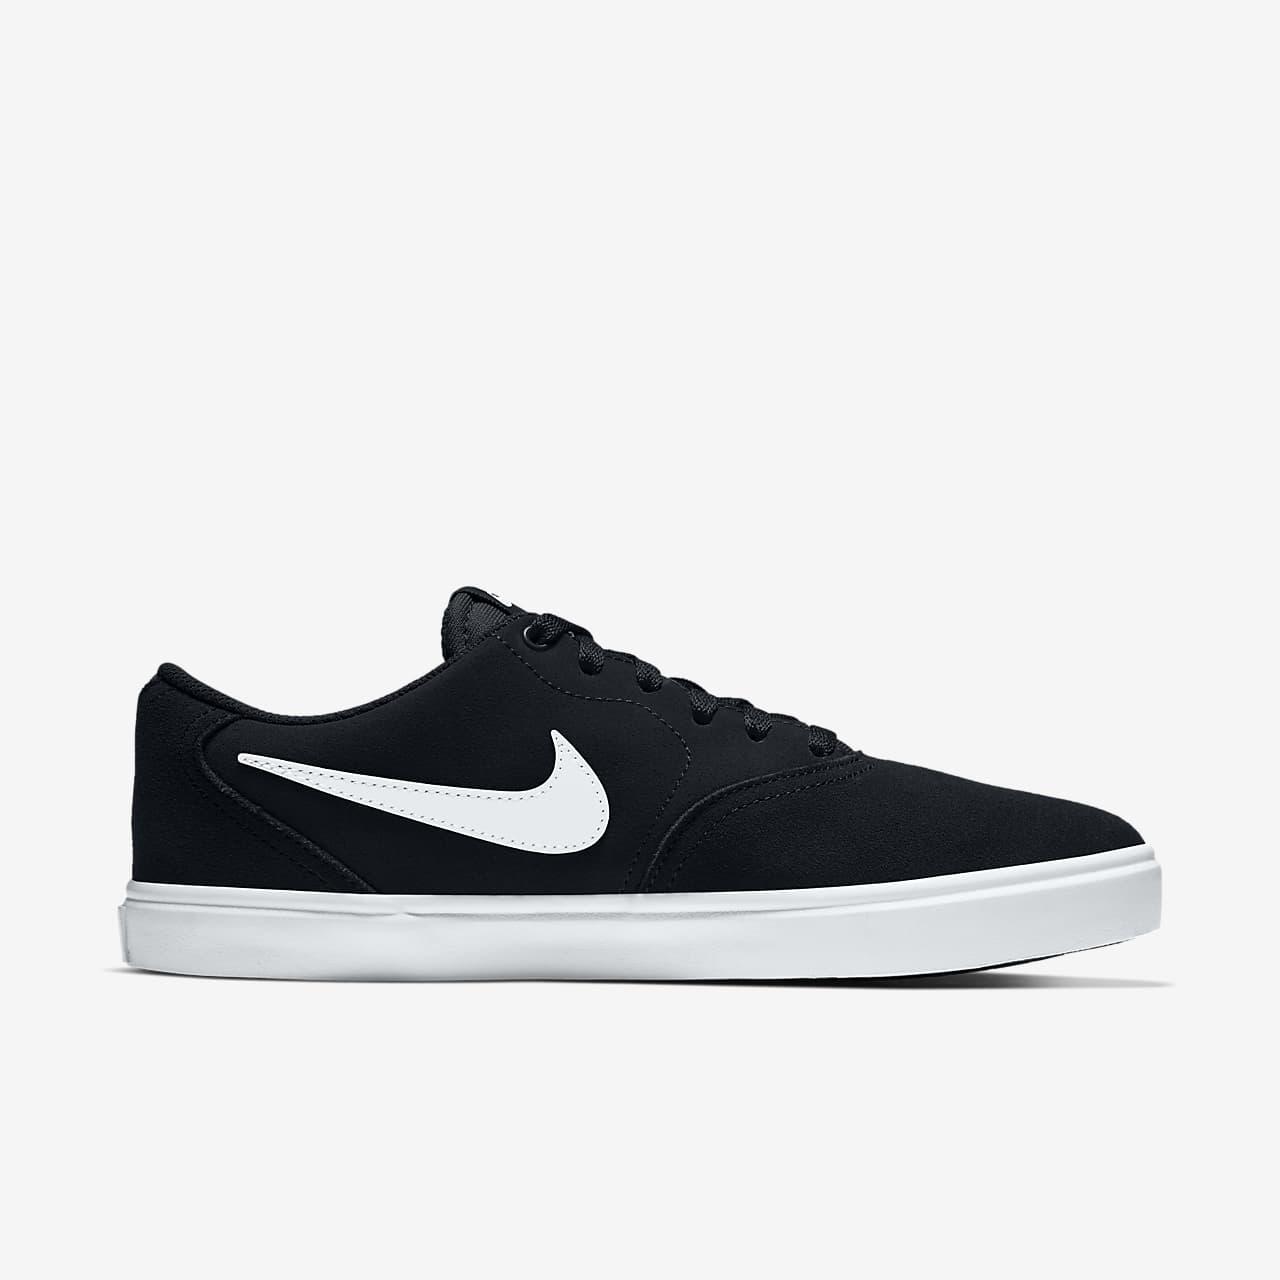 Nike Sb Check Solarsoft Skate Shoe